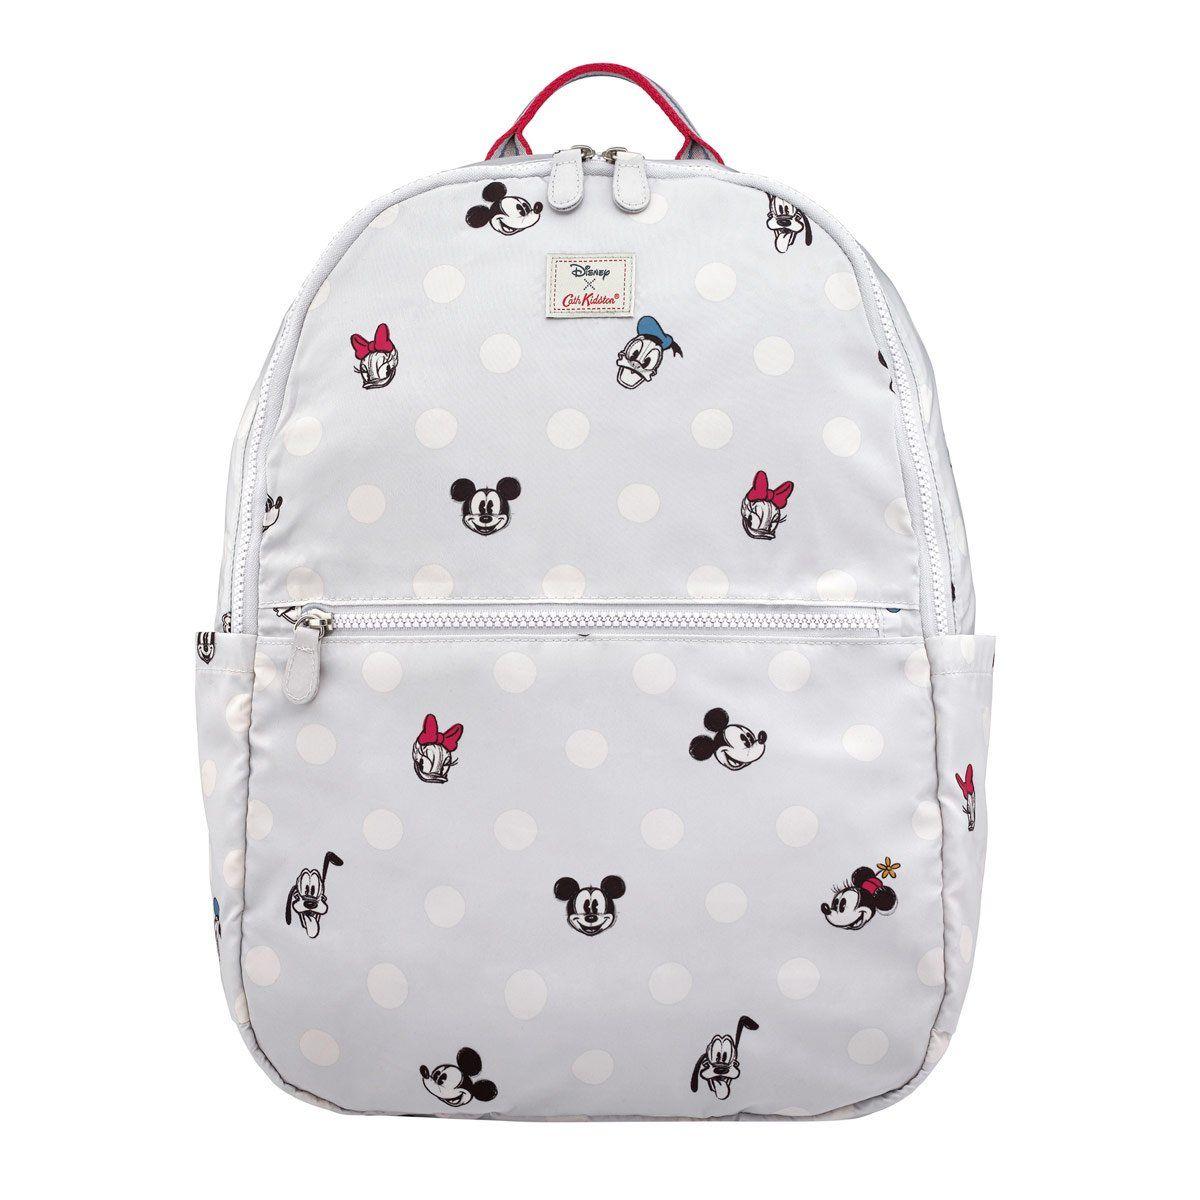 Cath Kidston Kids Disney Backpack Blue BNWT